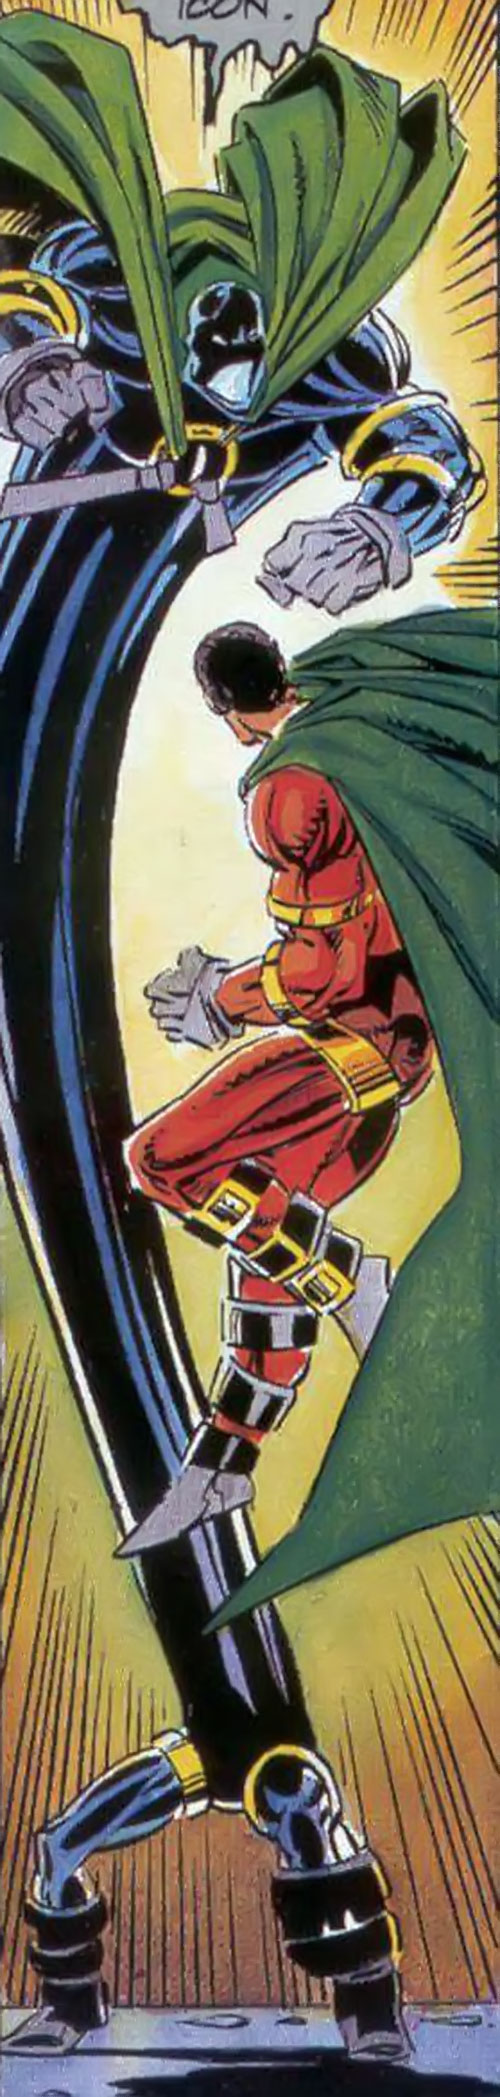 Oblivion (Milestone Comics) stretching its body to fight Icon